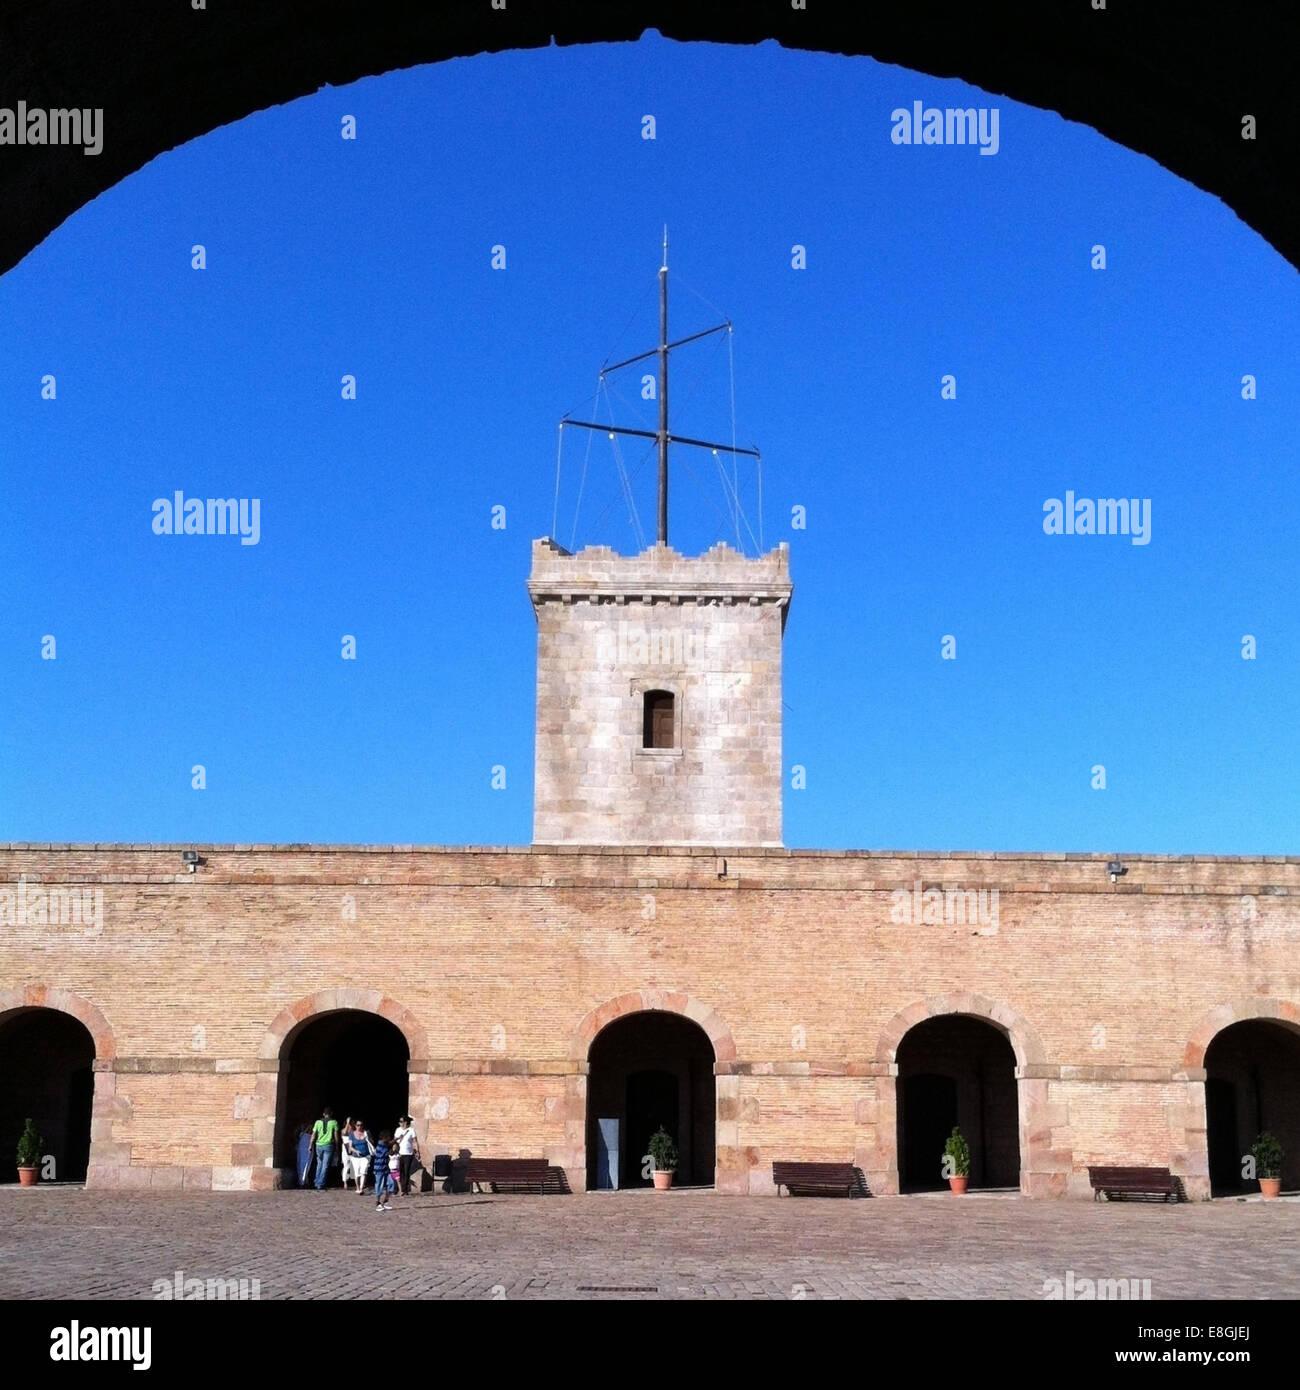 Spain, Catalonia, Barcelona, View of Montjuic castle - Stock Image